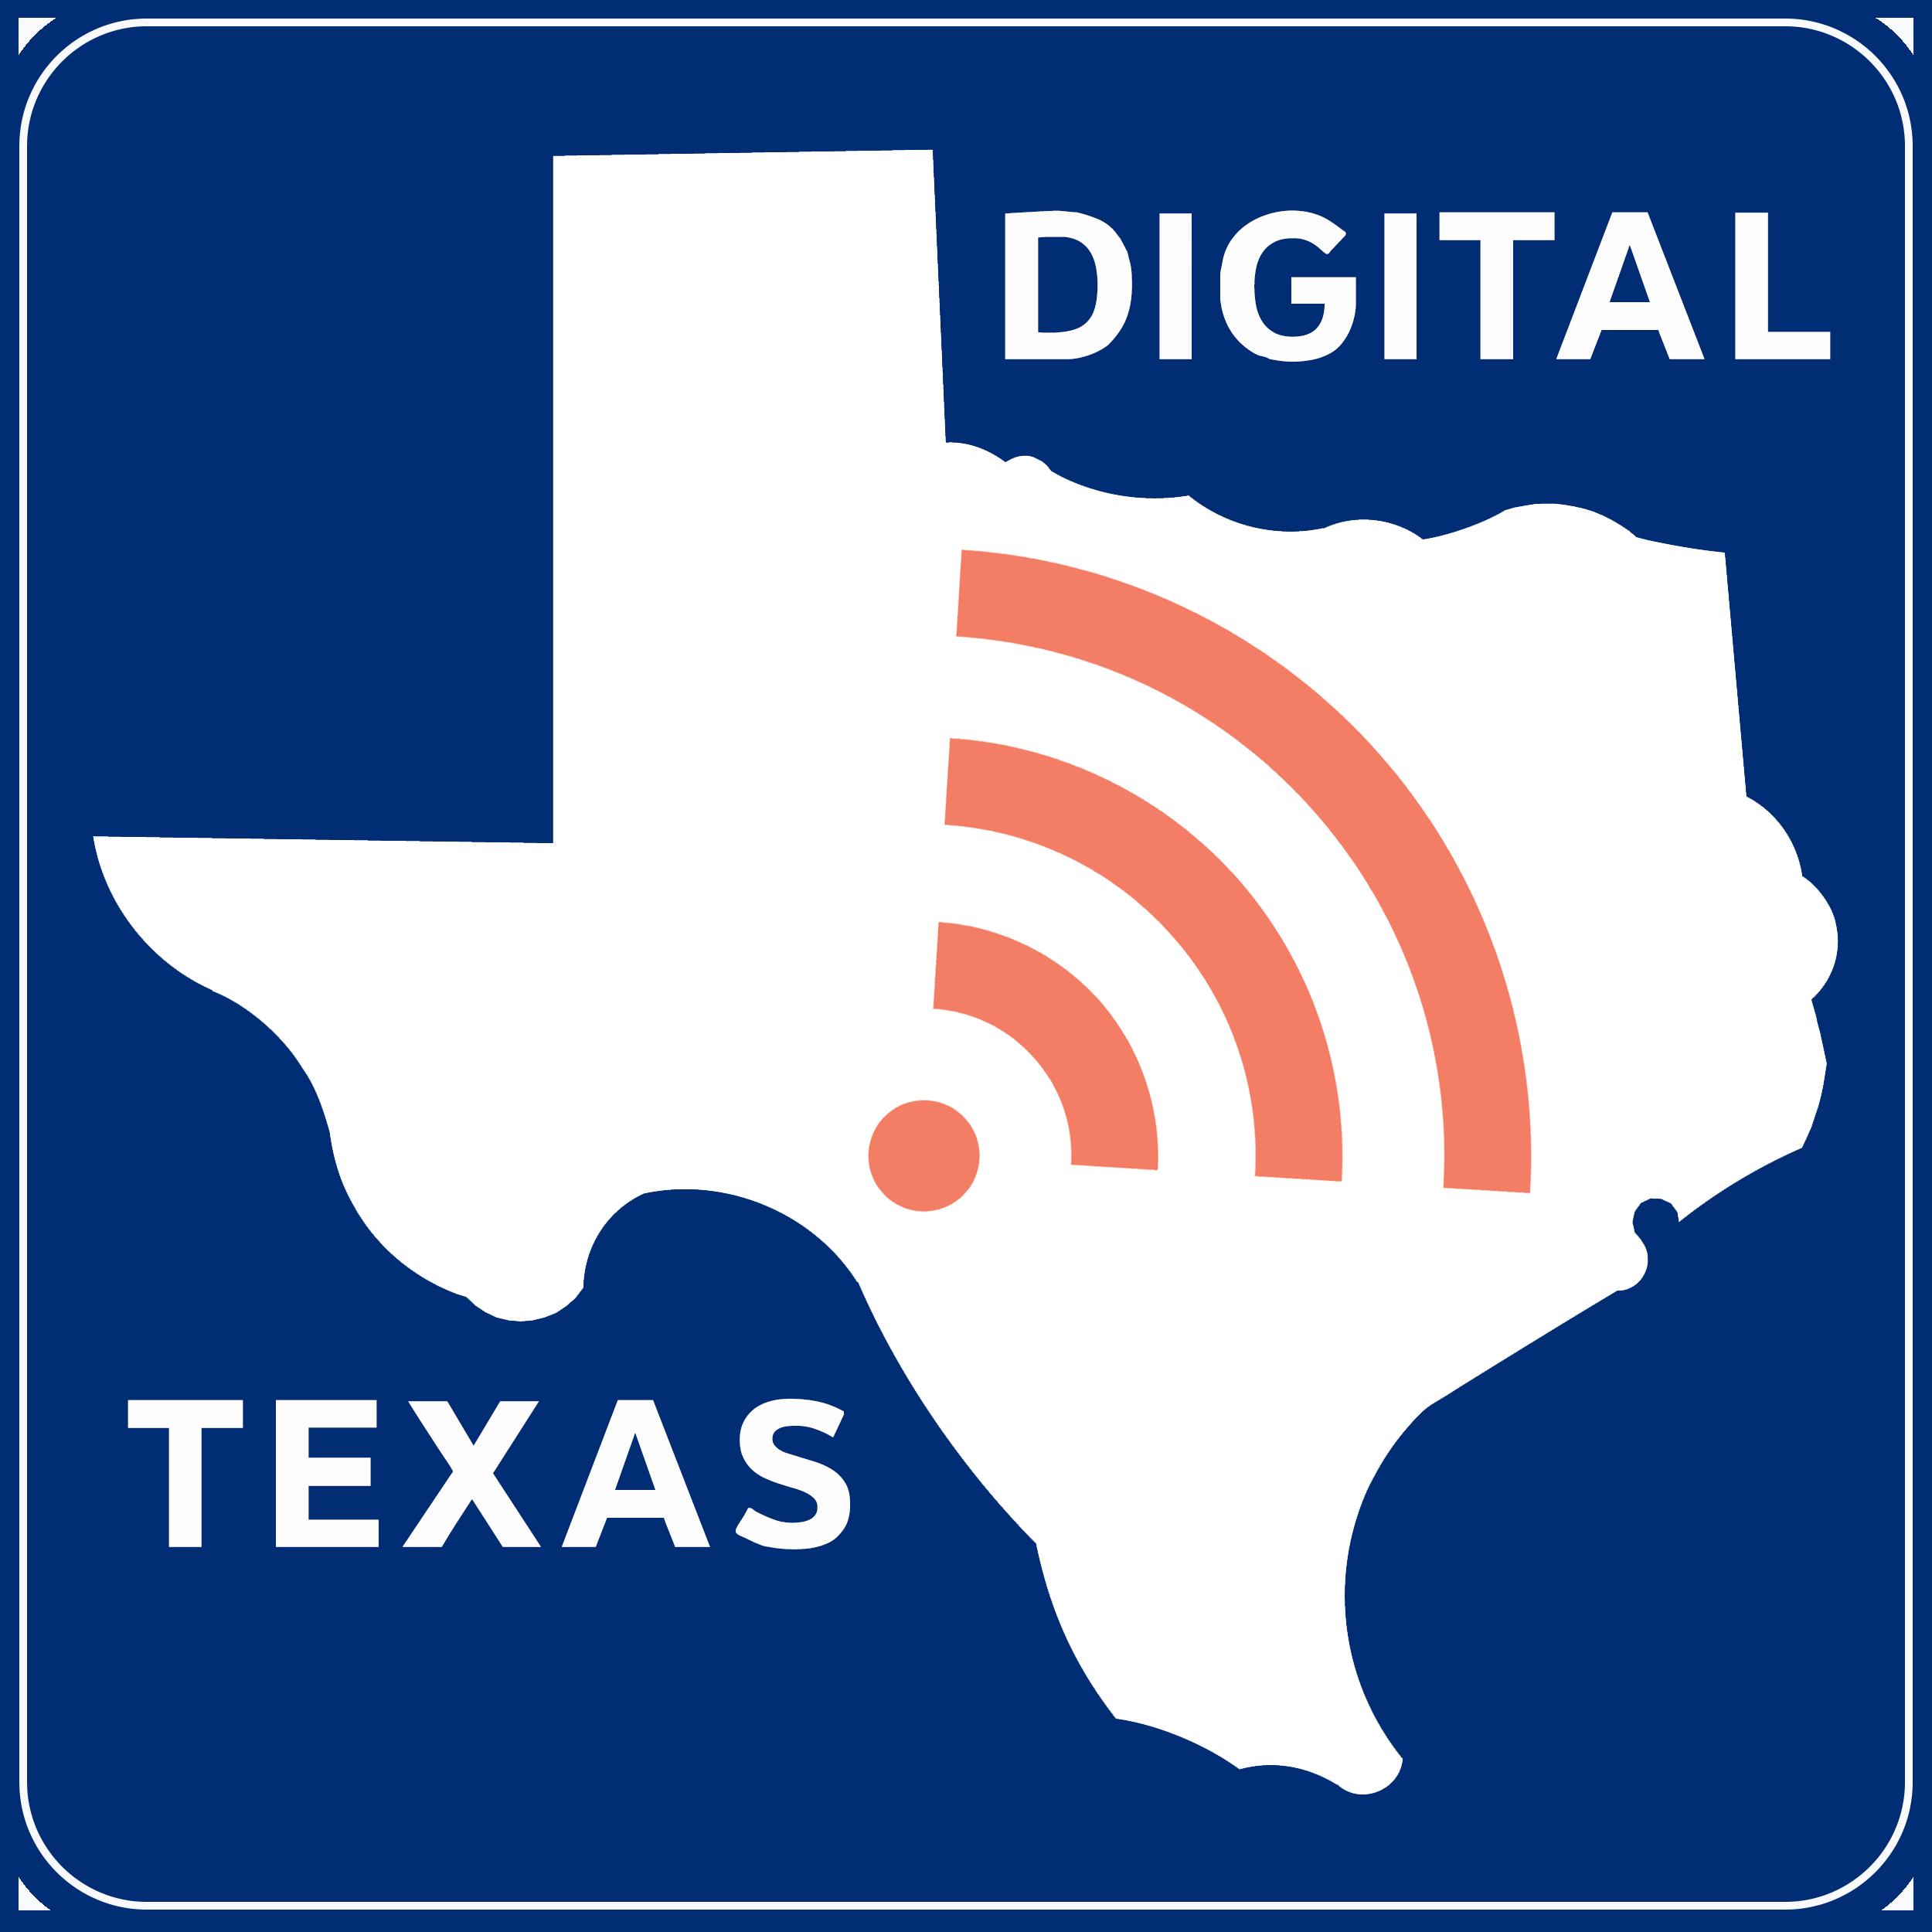 Digital Texas